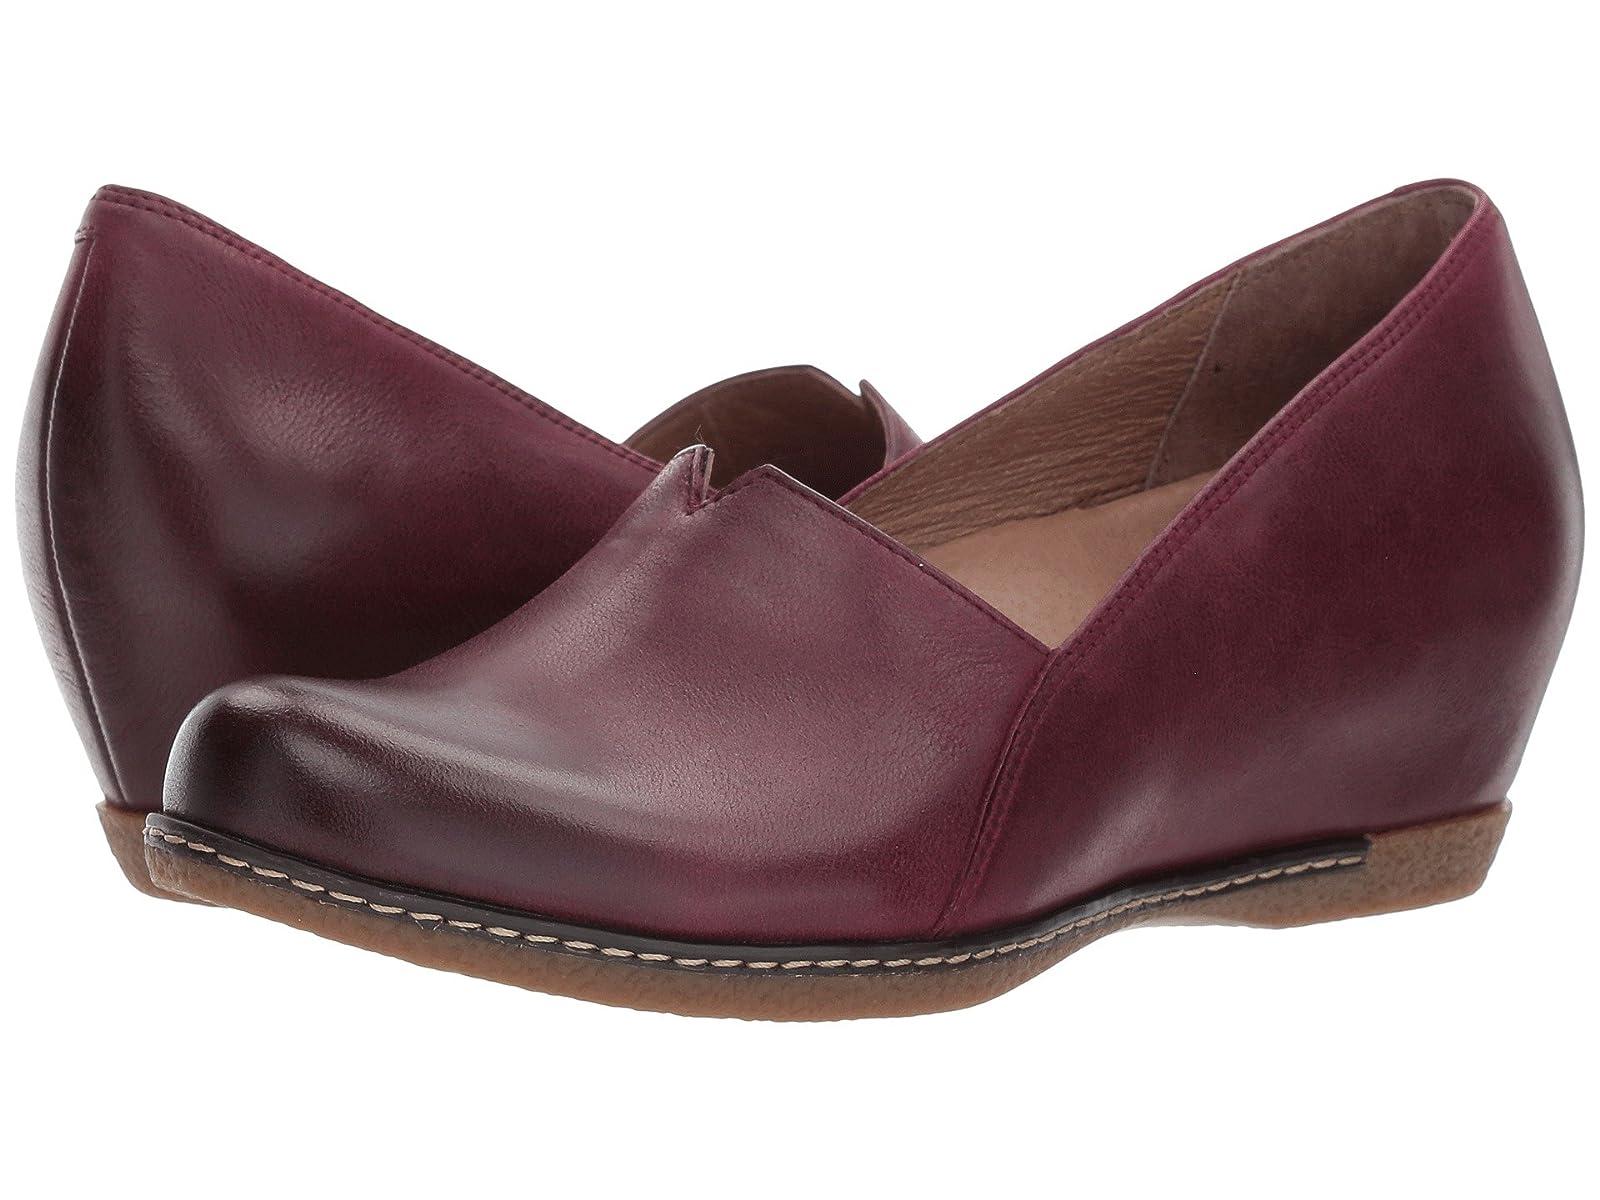 Dansko LilianaCheap and distinctive eye-catching shoes